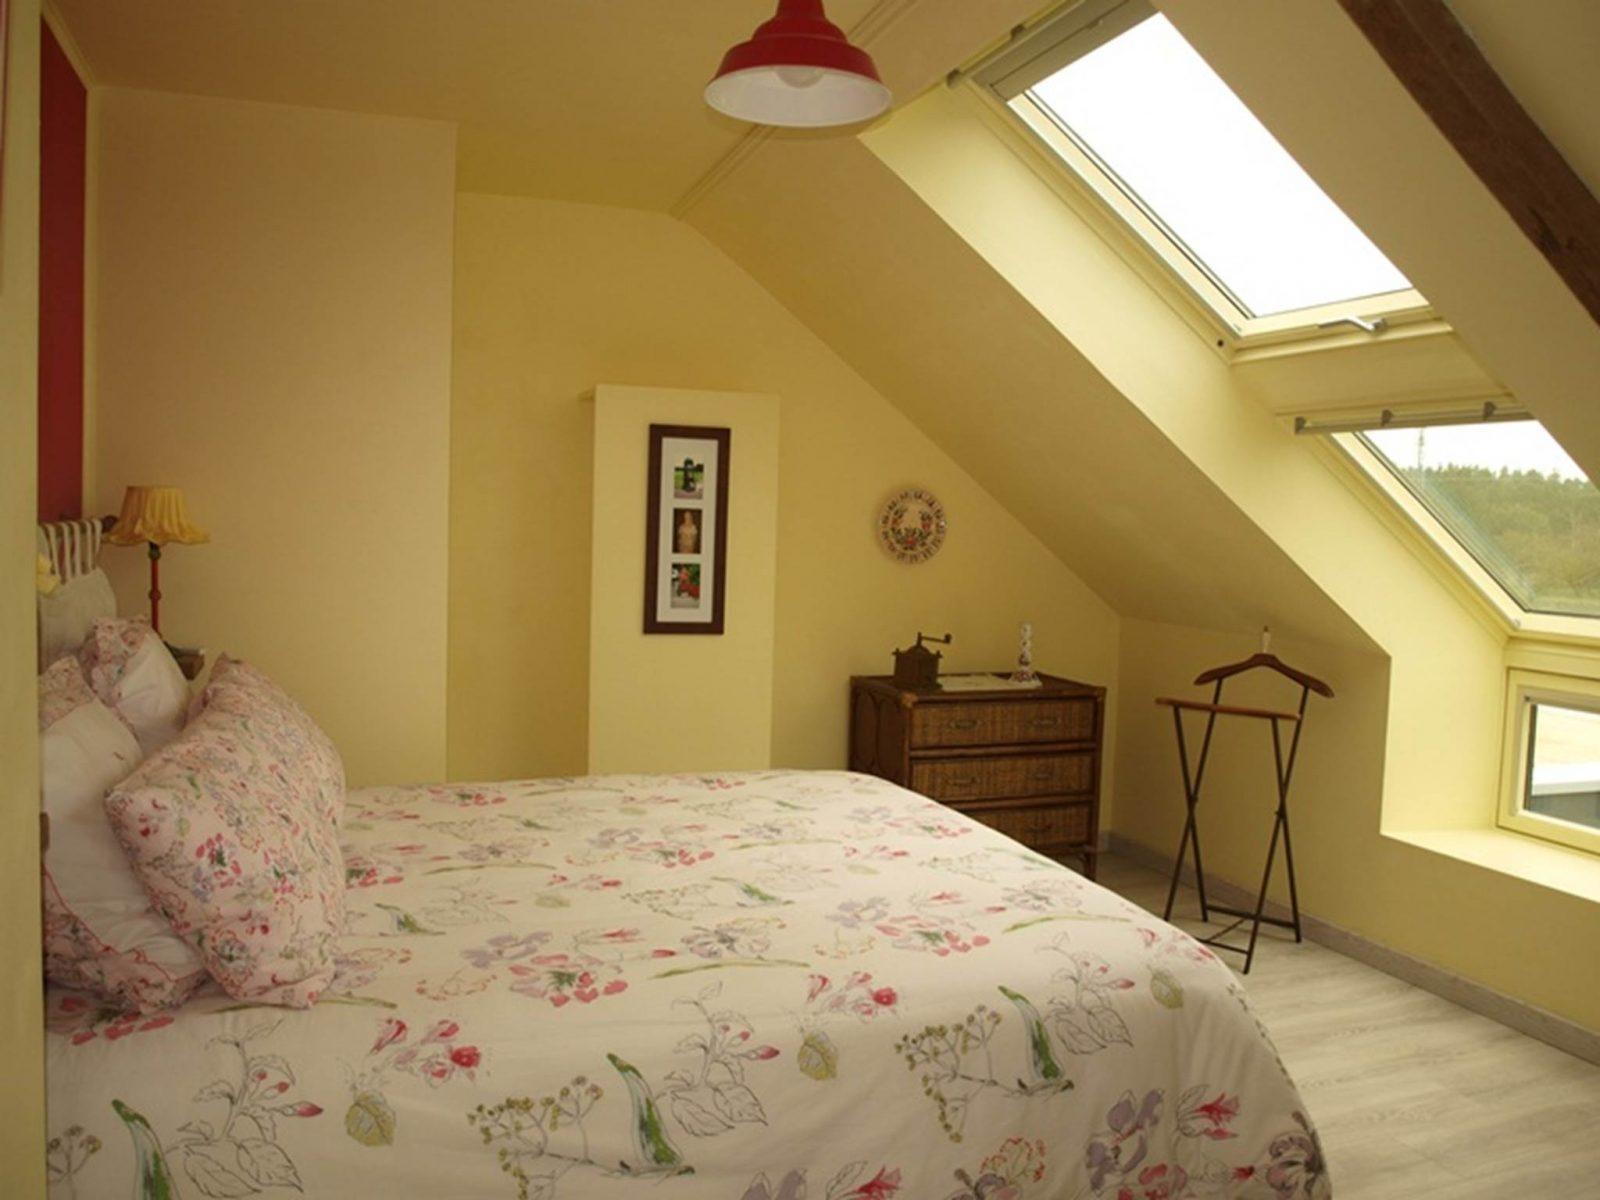 chambre d'hote-Takacs-St Dolay-Tourisme Arc Sud Bretagne